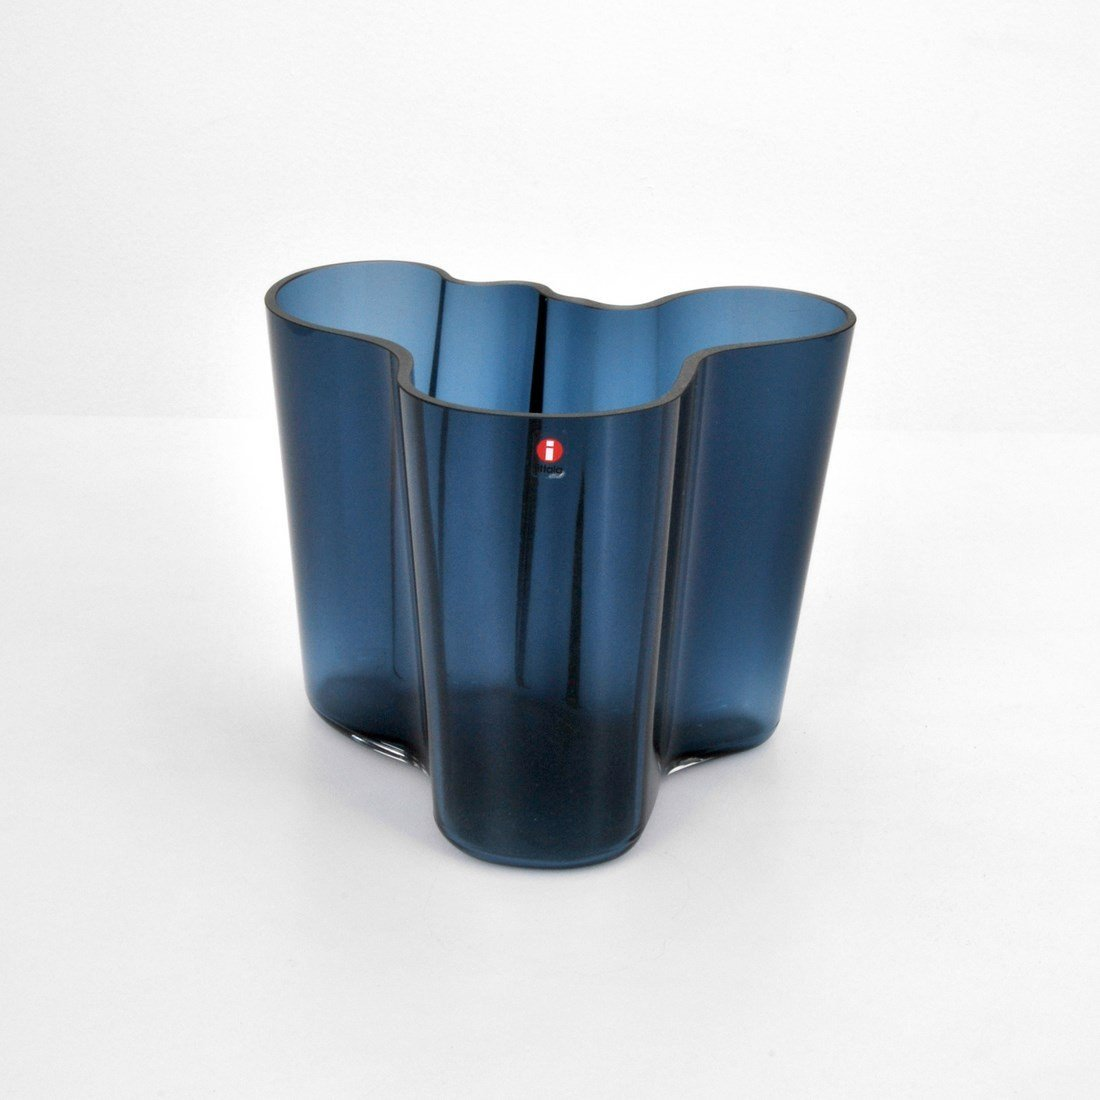 Alvar Aalto Glass 'Savoy' Vase/Vessel - 2